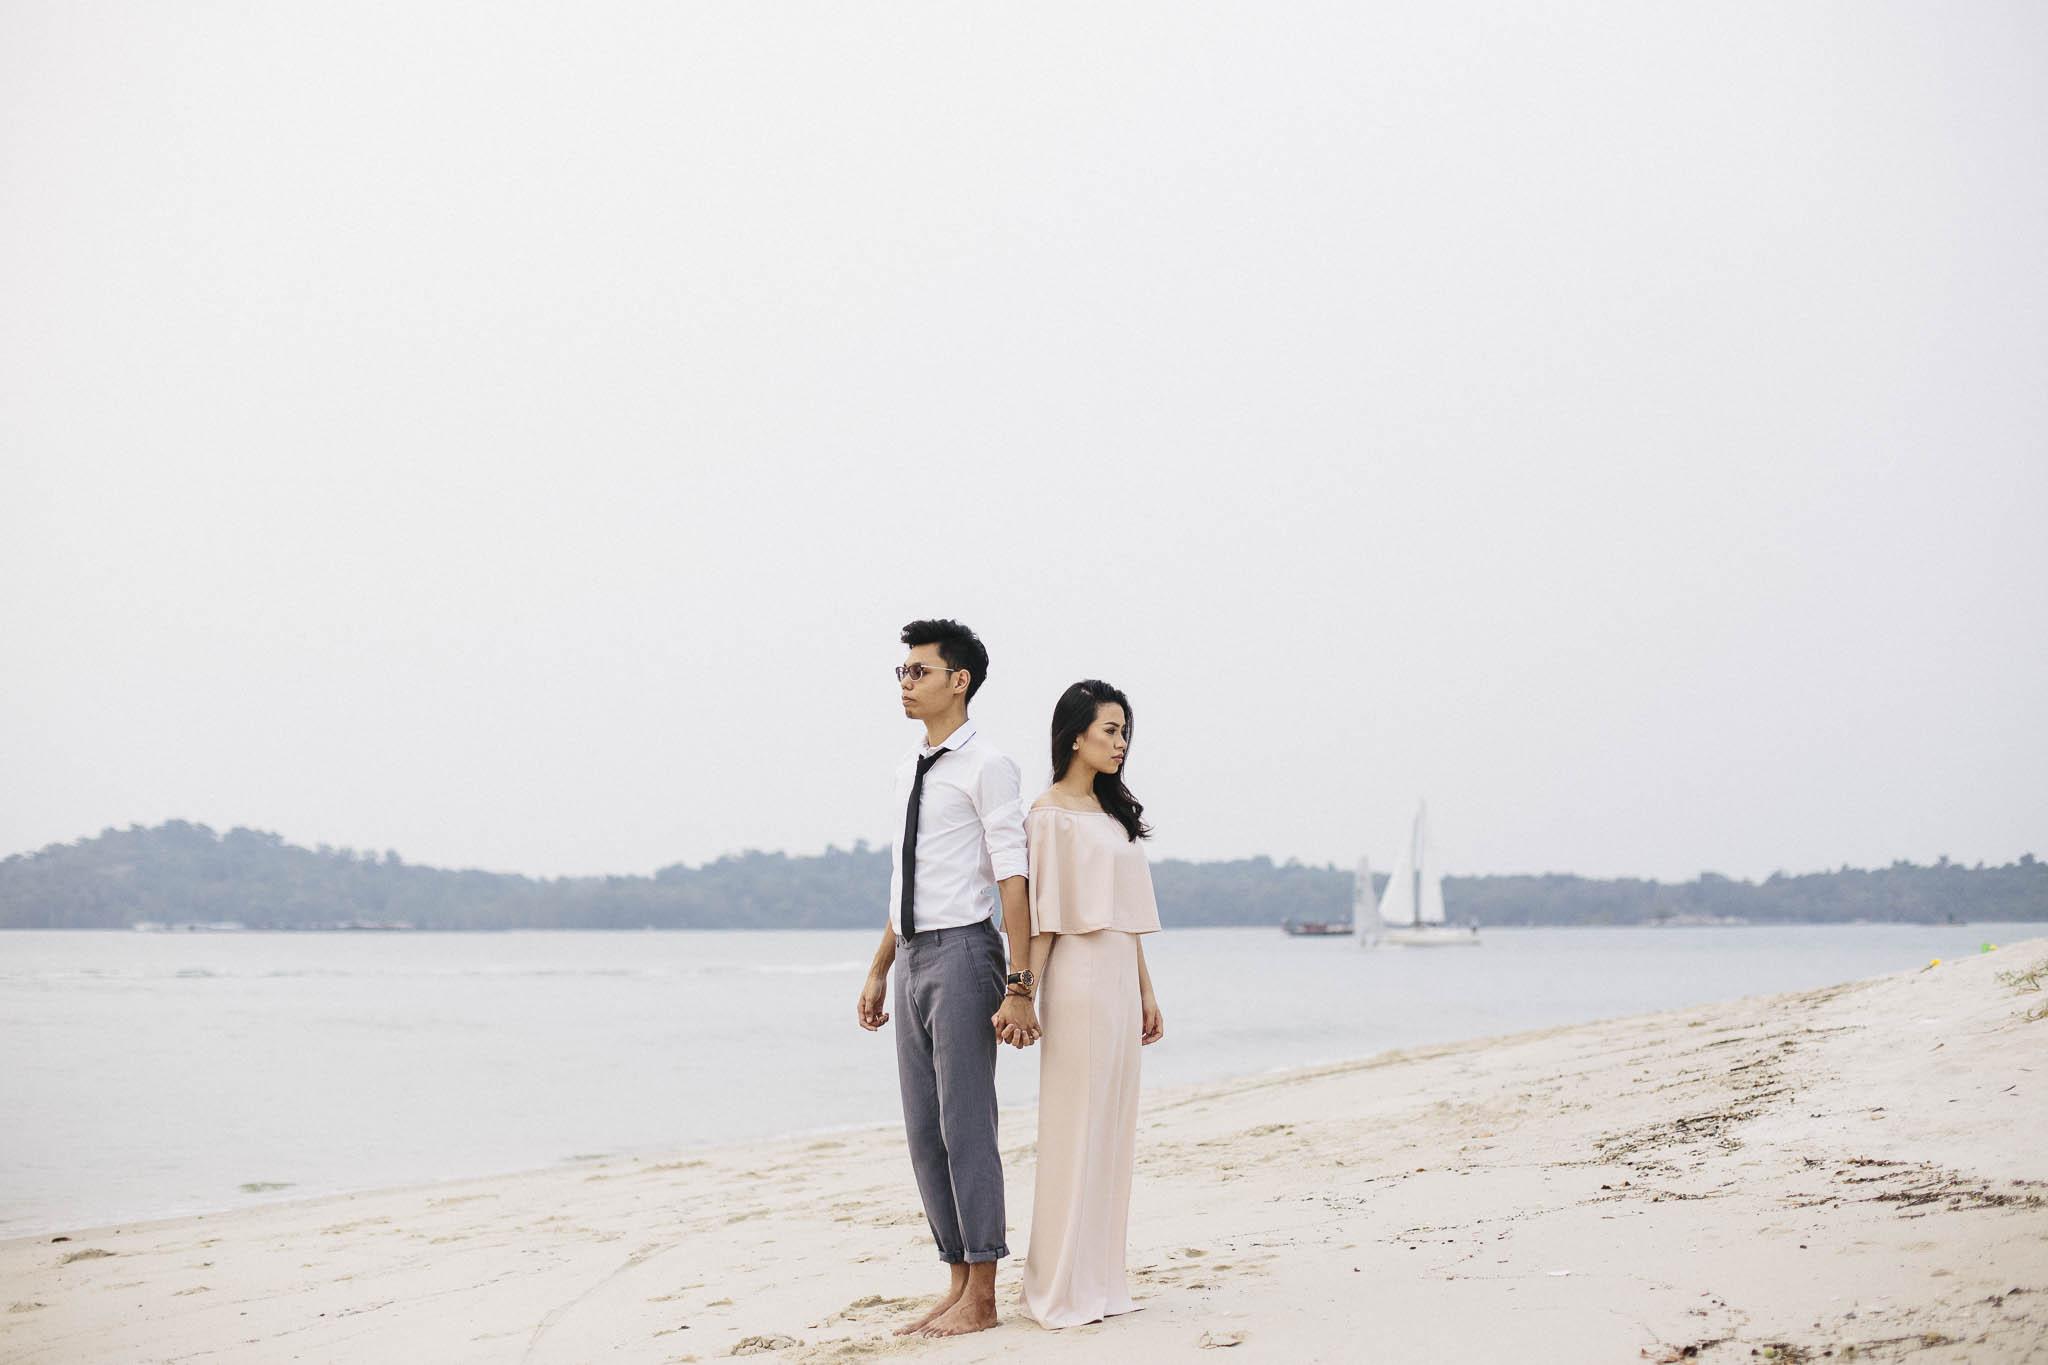 singapore-wedding-photographer-malay-indian-pre-wedding-travel-wmt-2015-06.jpg